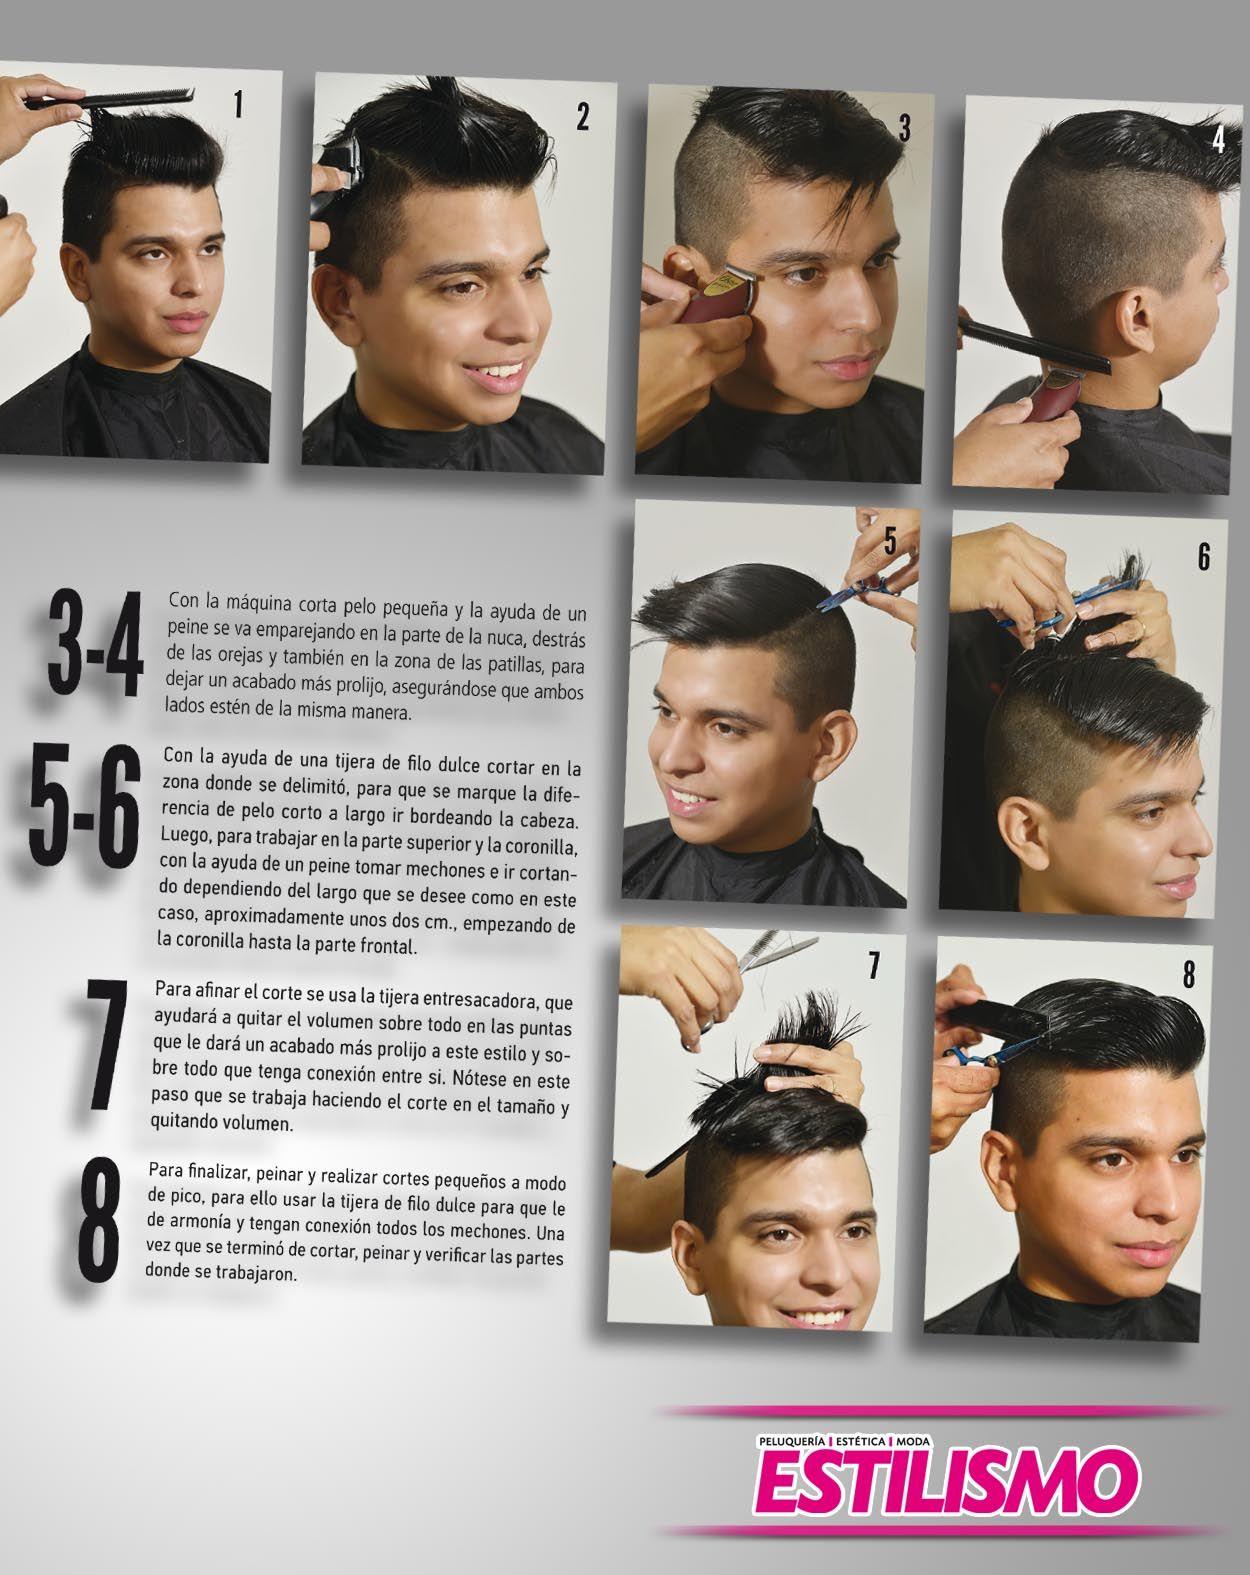 Mens haircut tutorials estilo mohicano un corte audaz  corte hombre  pinterest  hair